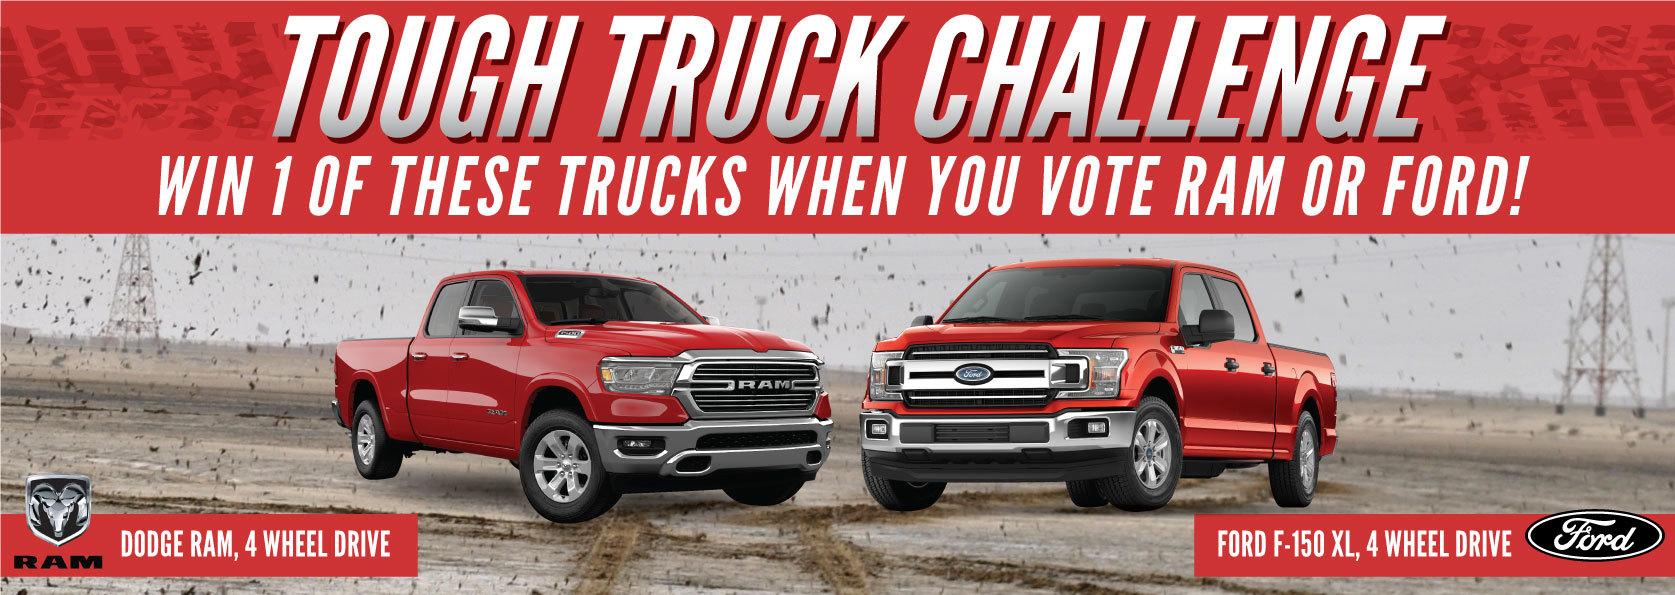 2018 truck raffles giveaways